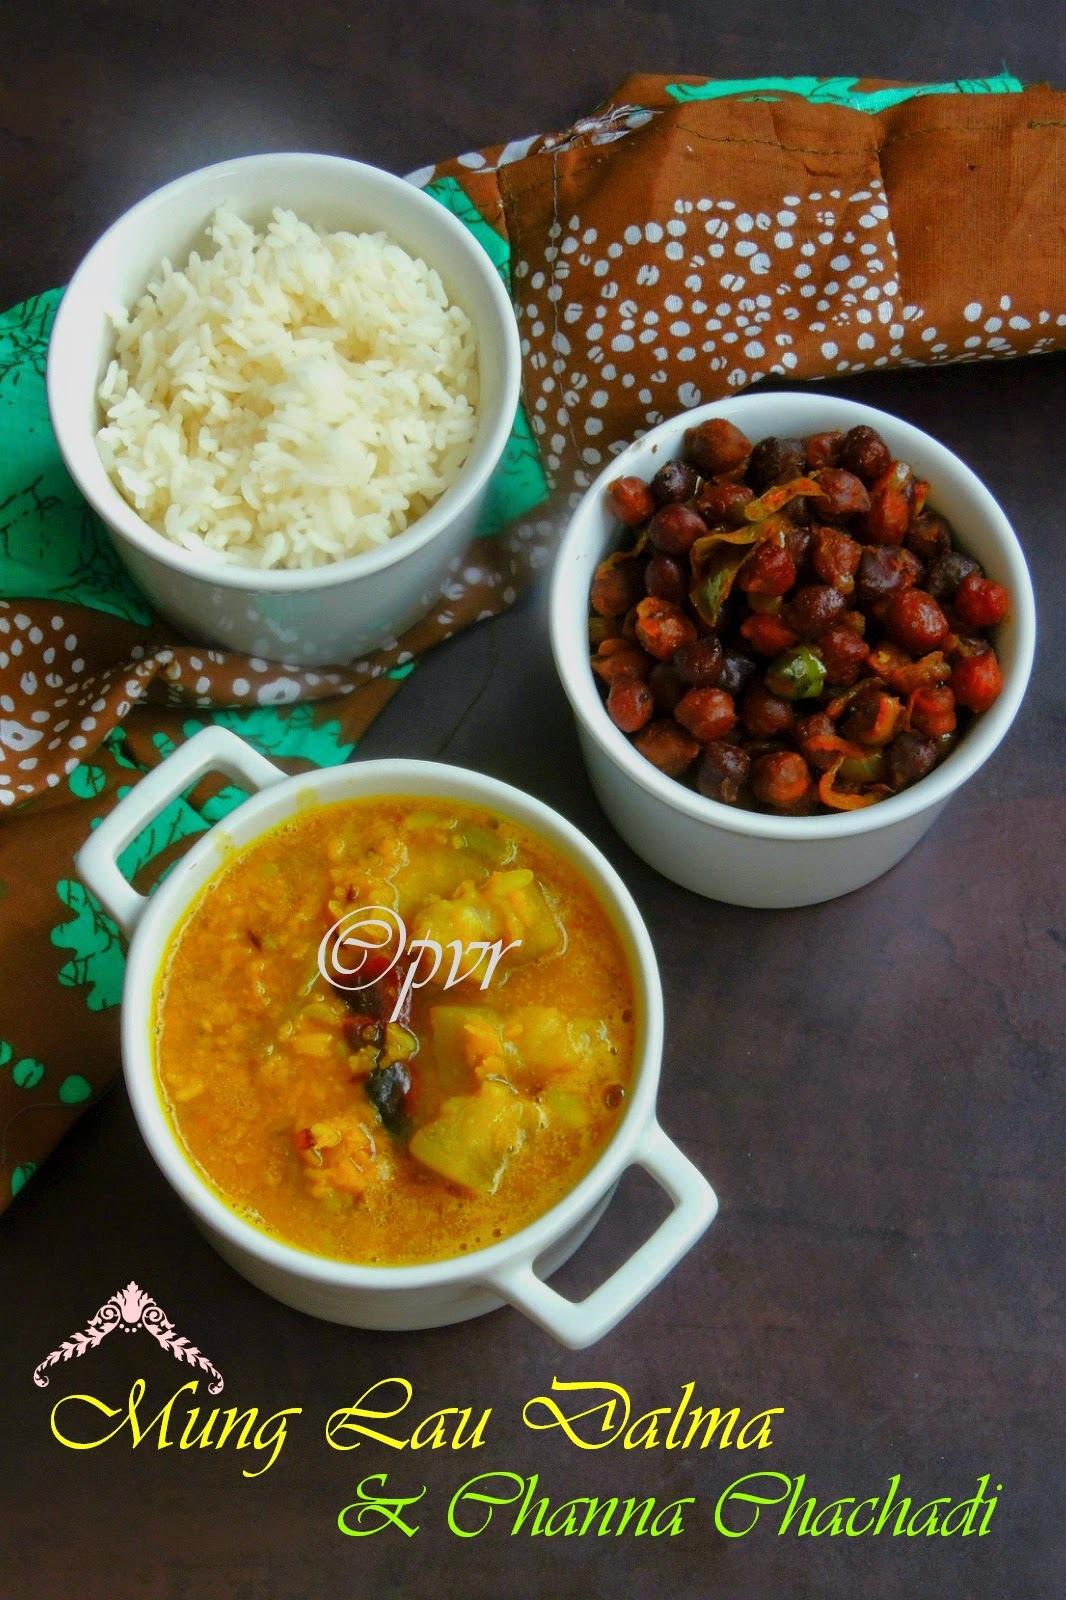 Mung Lau Dalma & Channa Chadchadi - Orissa/Odisha Special